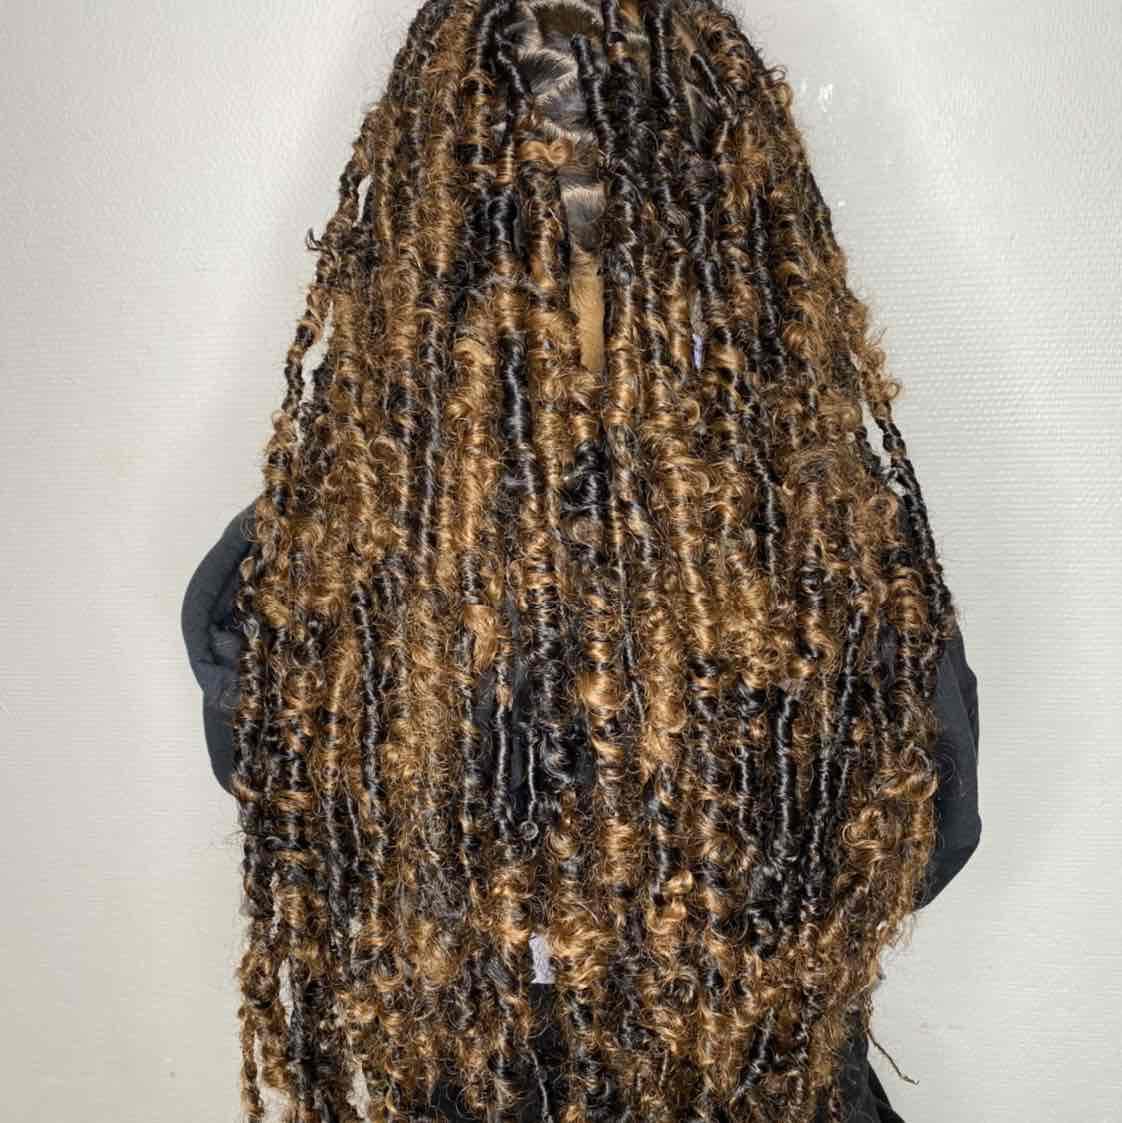 salon de coiffure afro tresse tresses box braids crochet braids vanilles tissages paris 75 77 78 91 92 93 94 95 ULGETYBH